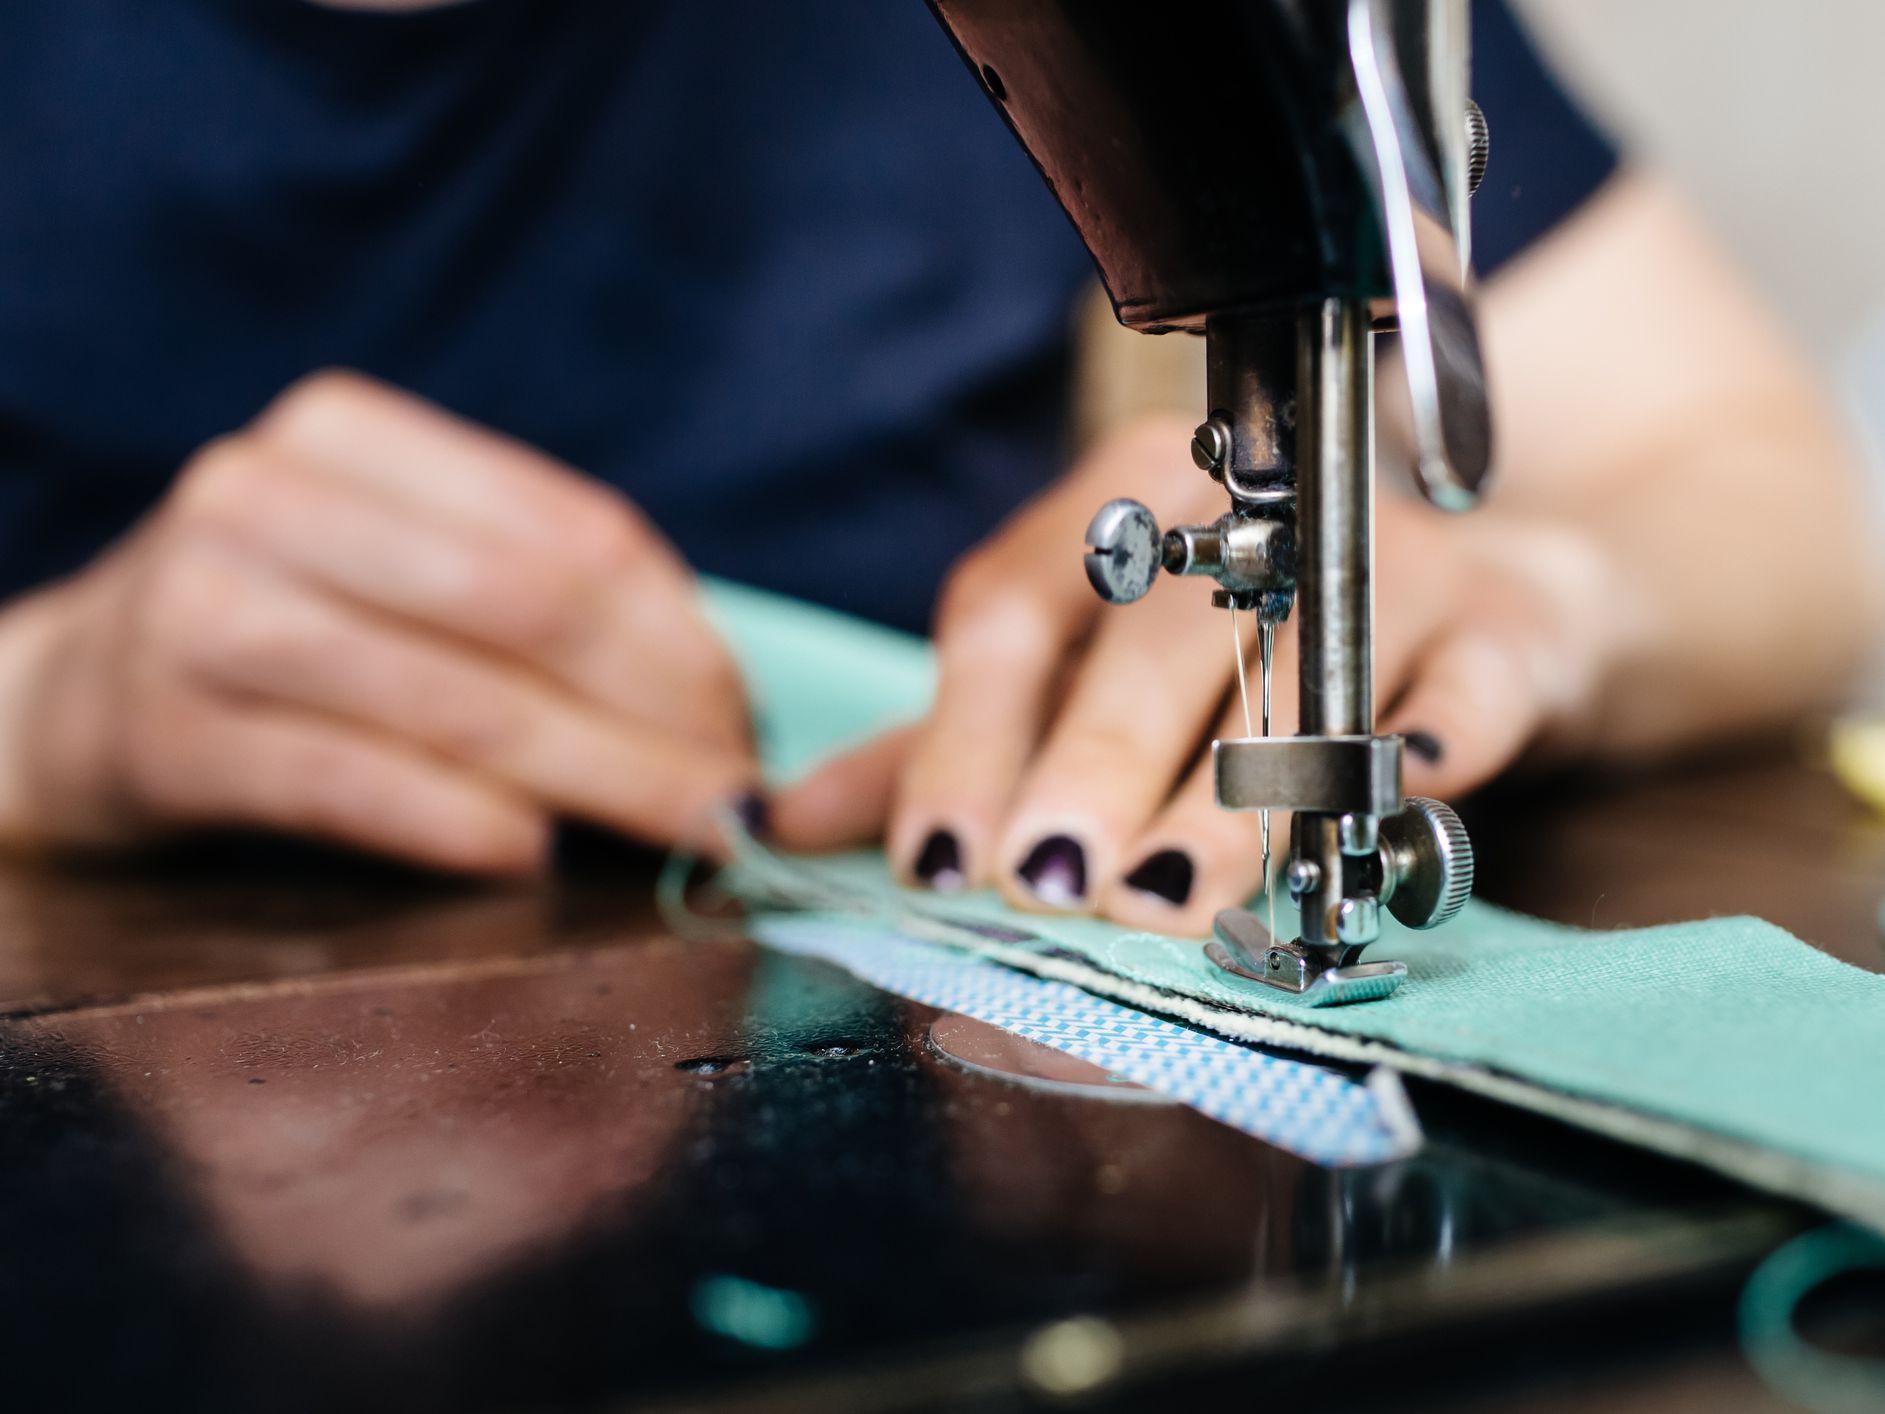 Adult Machine Sewing 201 Series